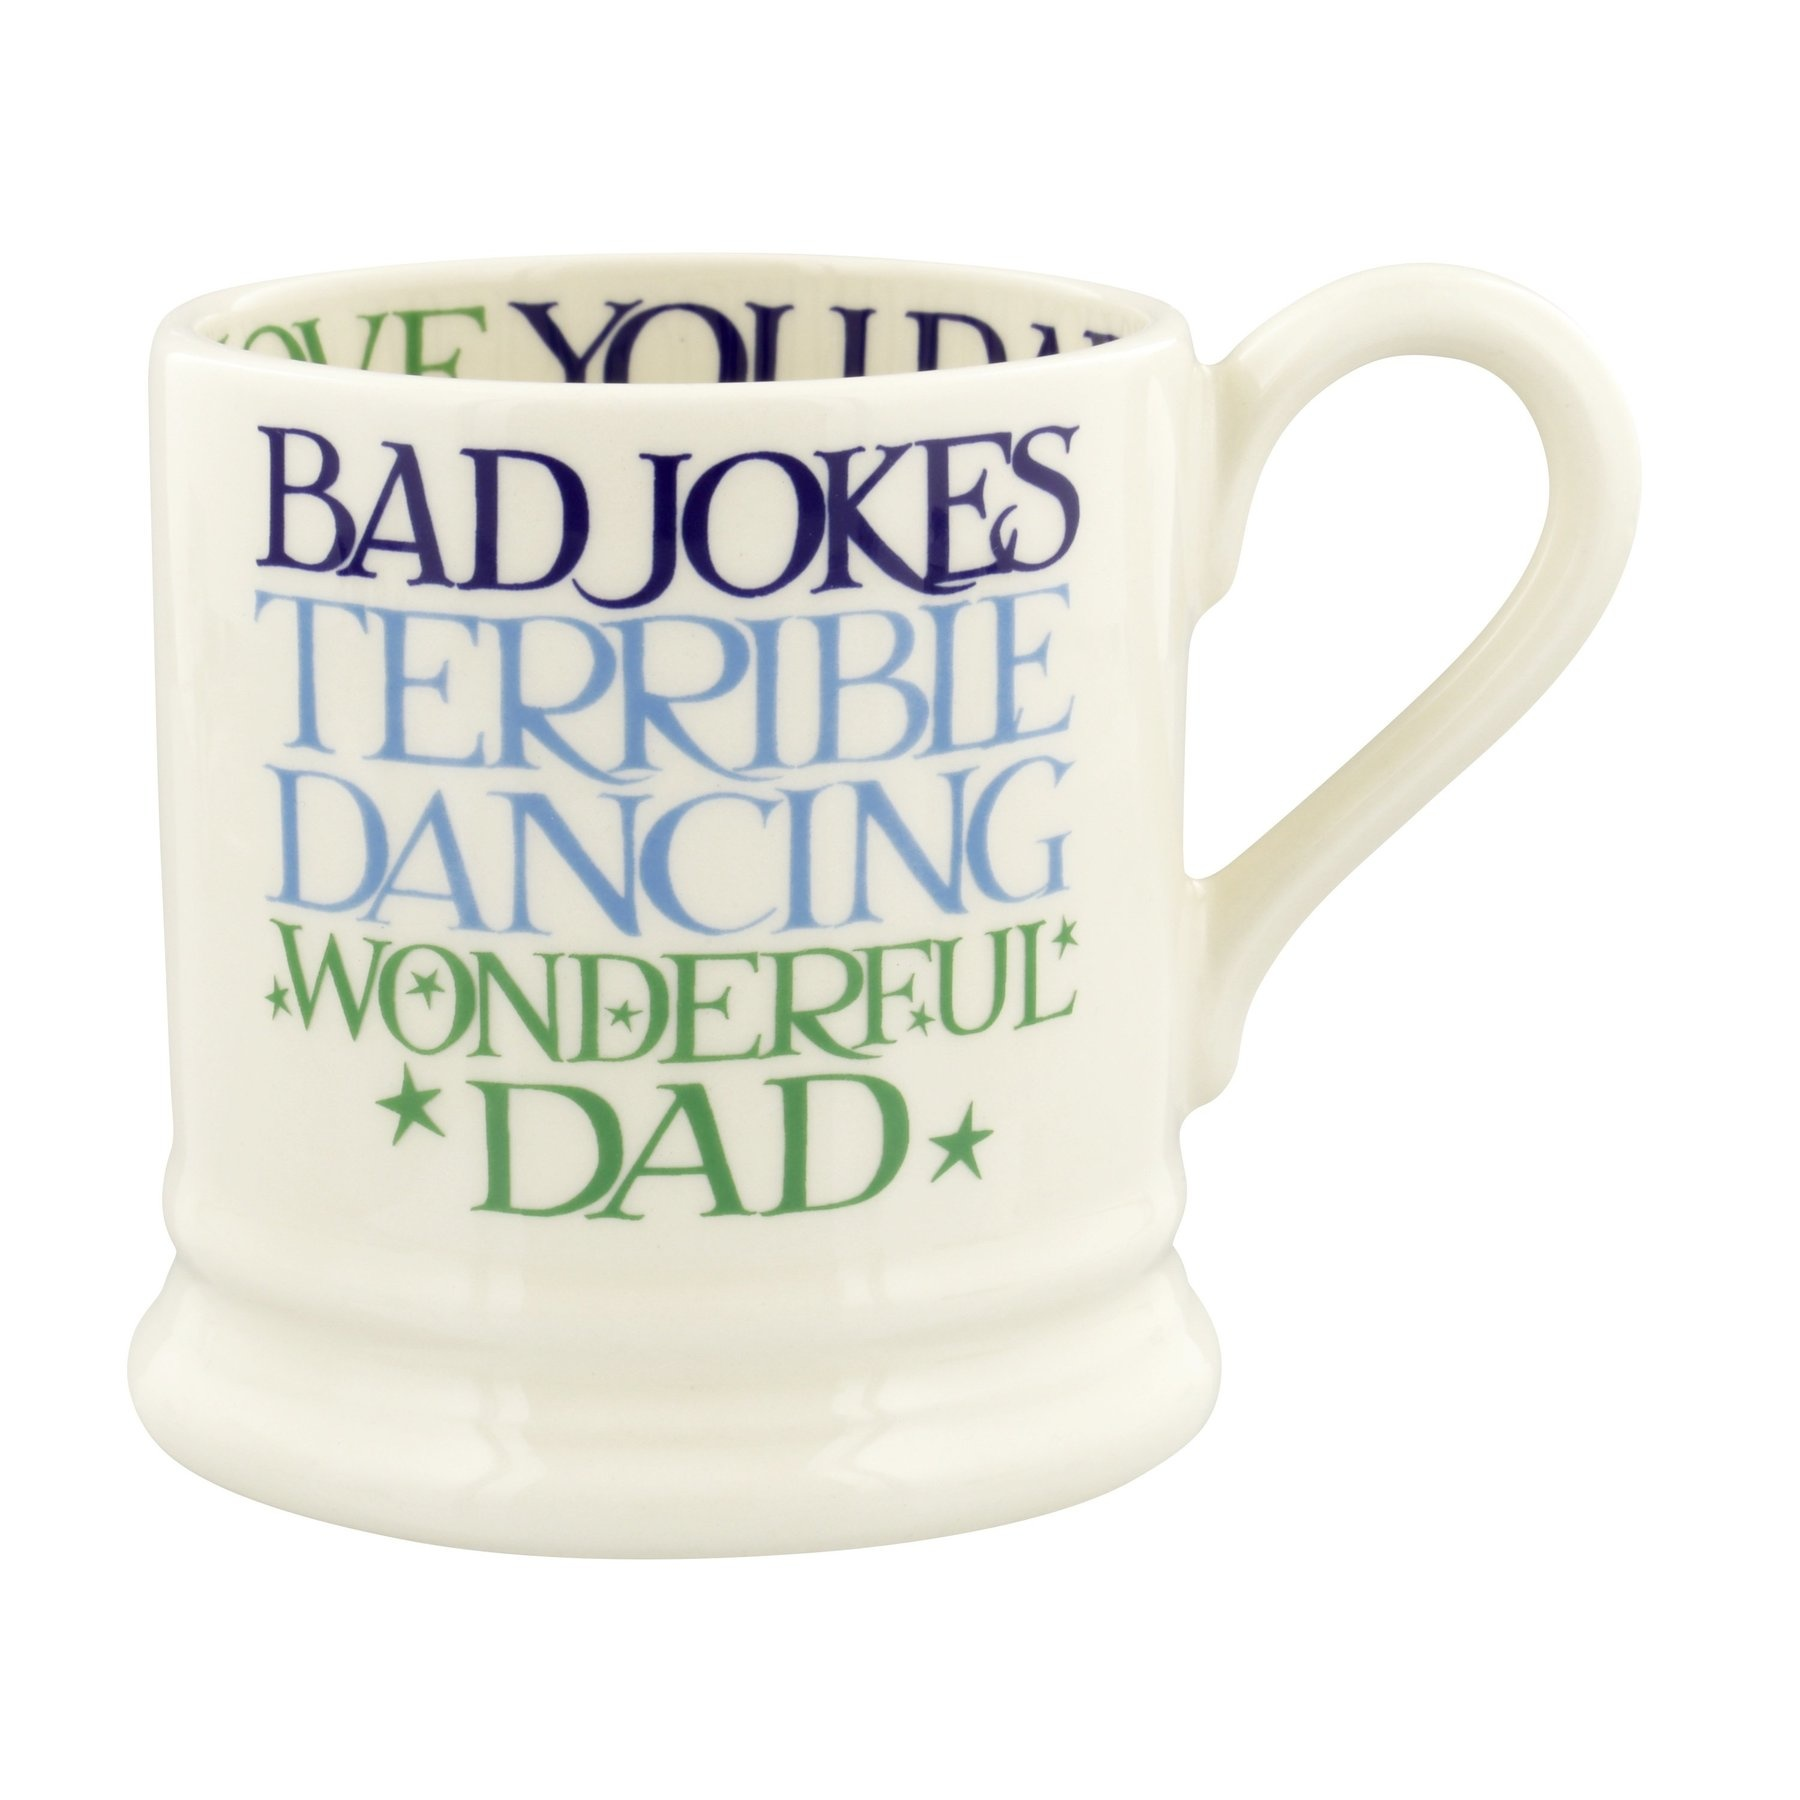 Boxed Wonderful Dad - 1/2 Pint Mug-3